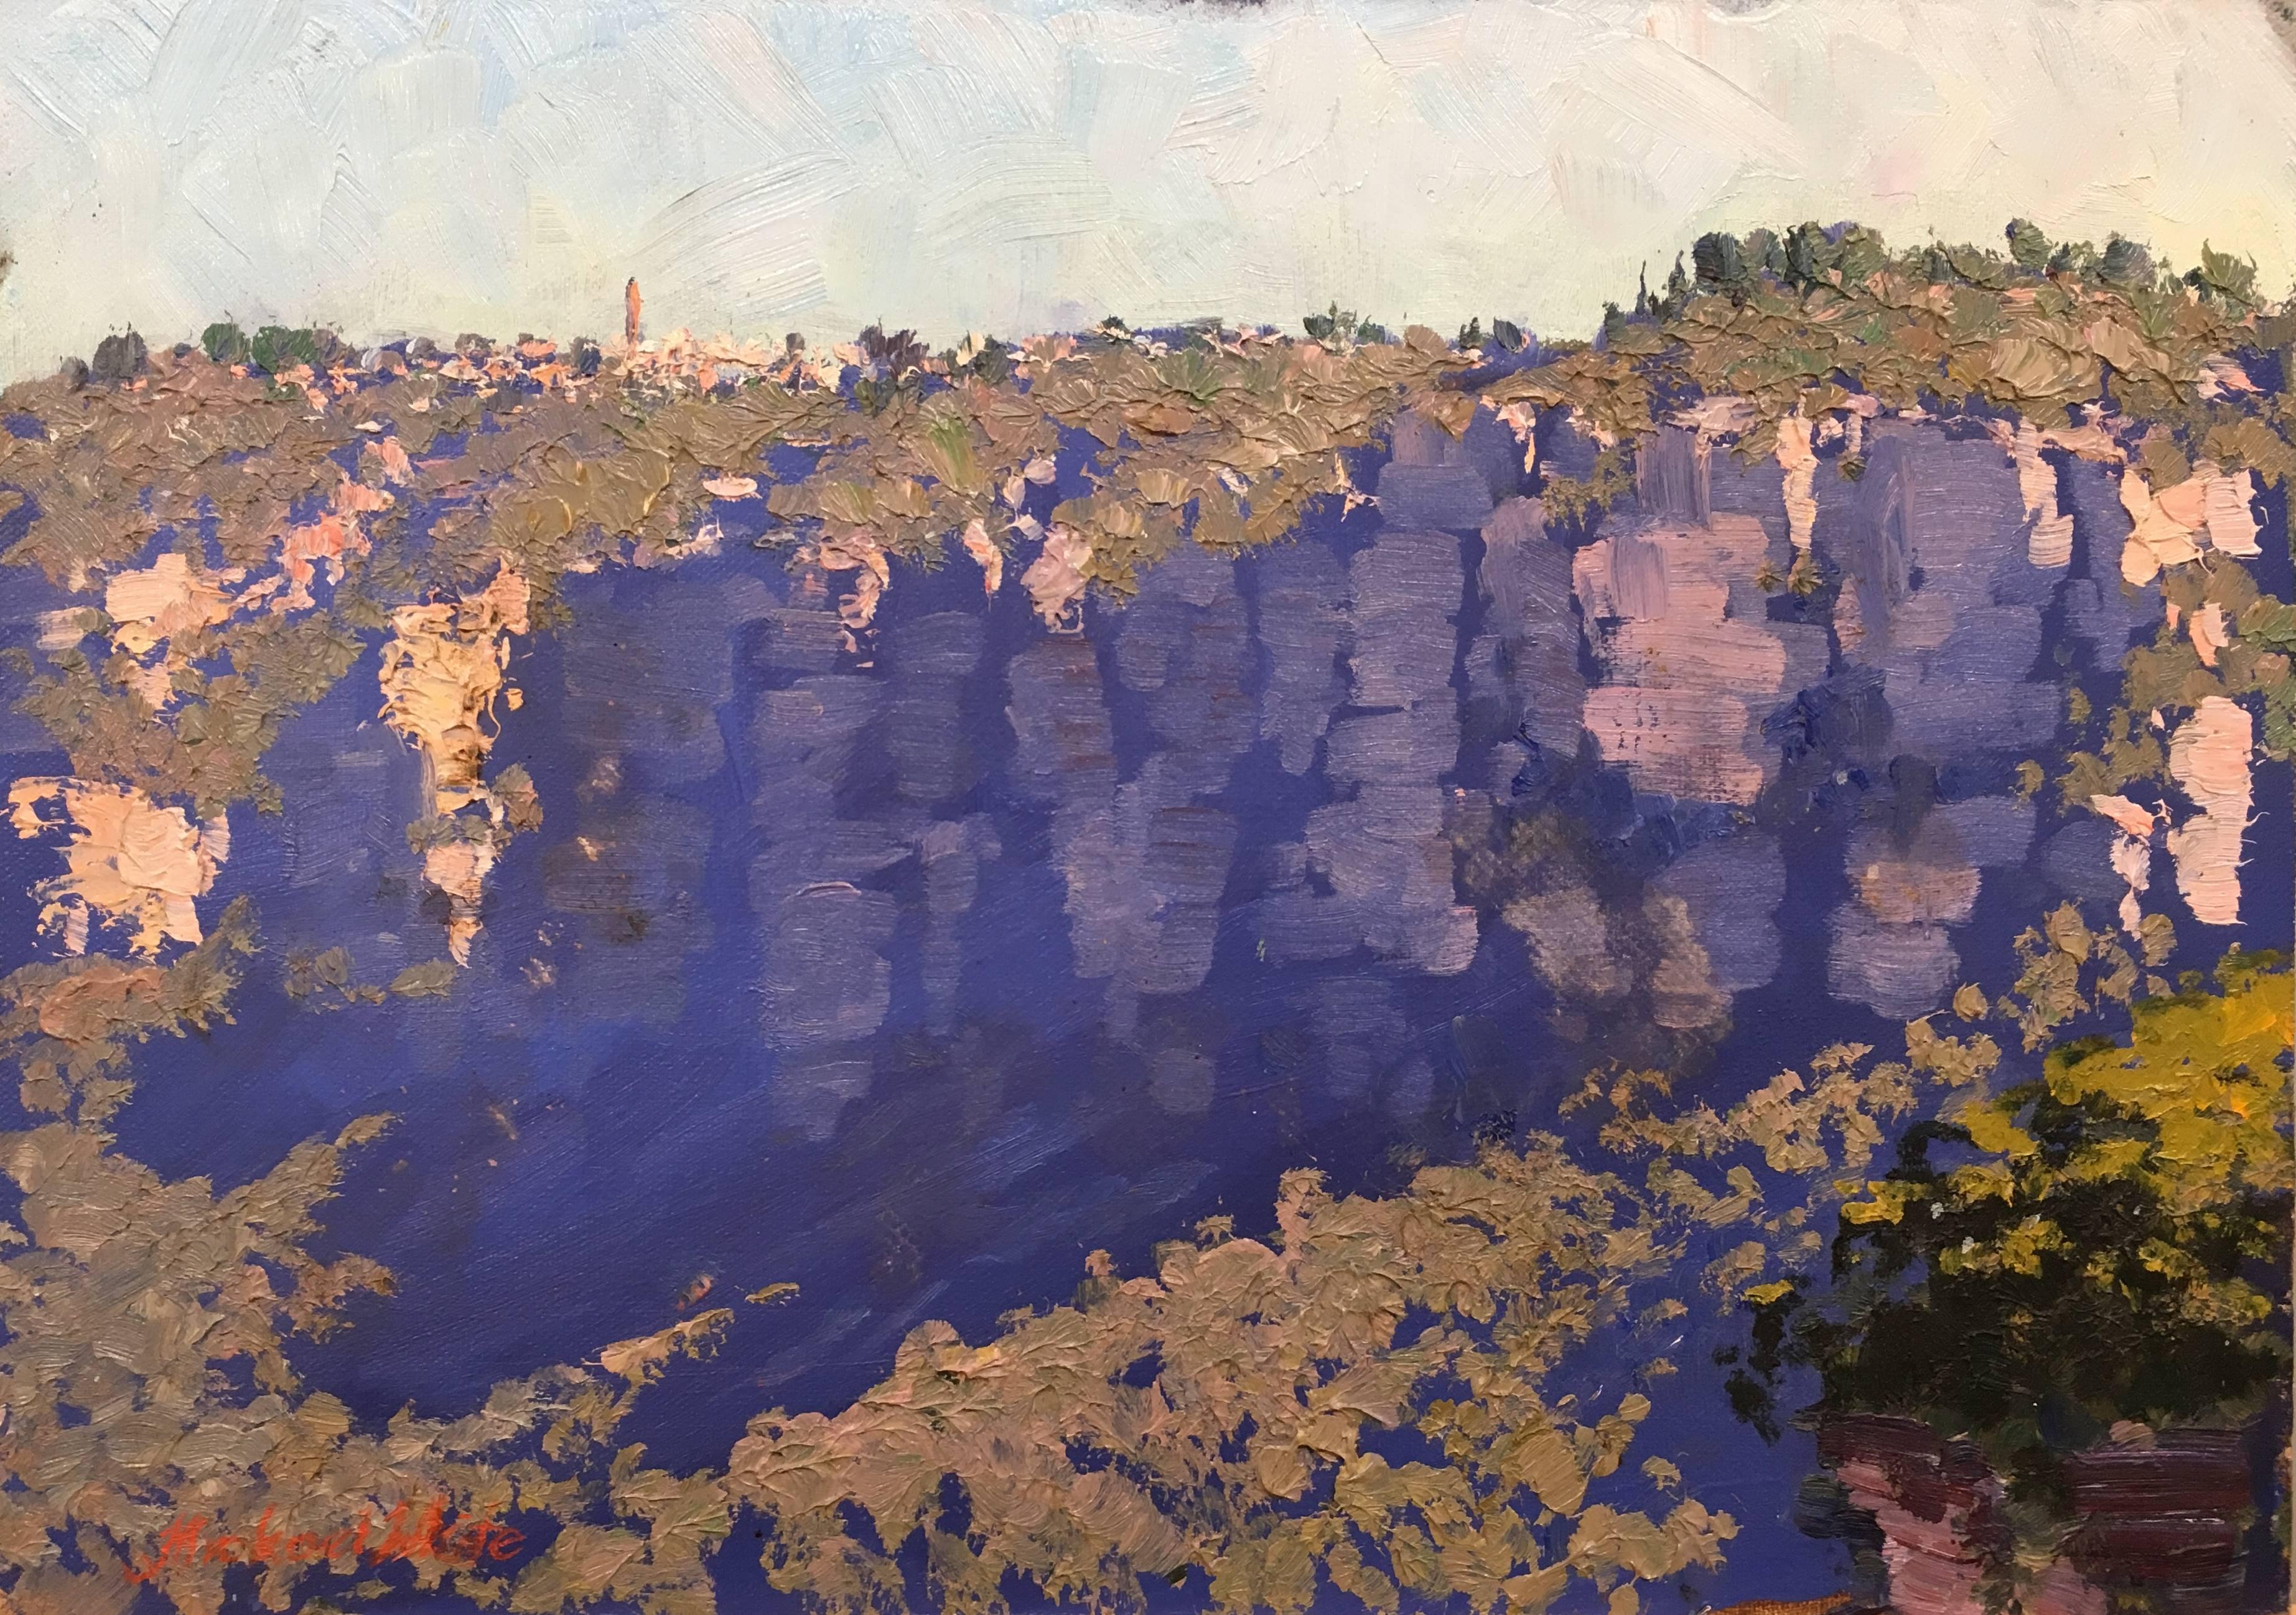 Katoomba Cliffs circa 1994